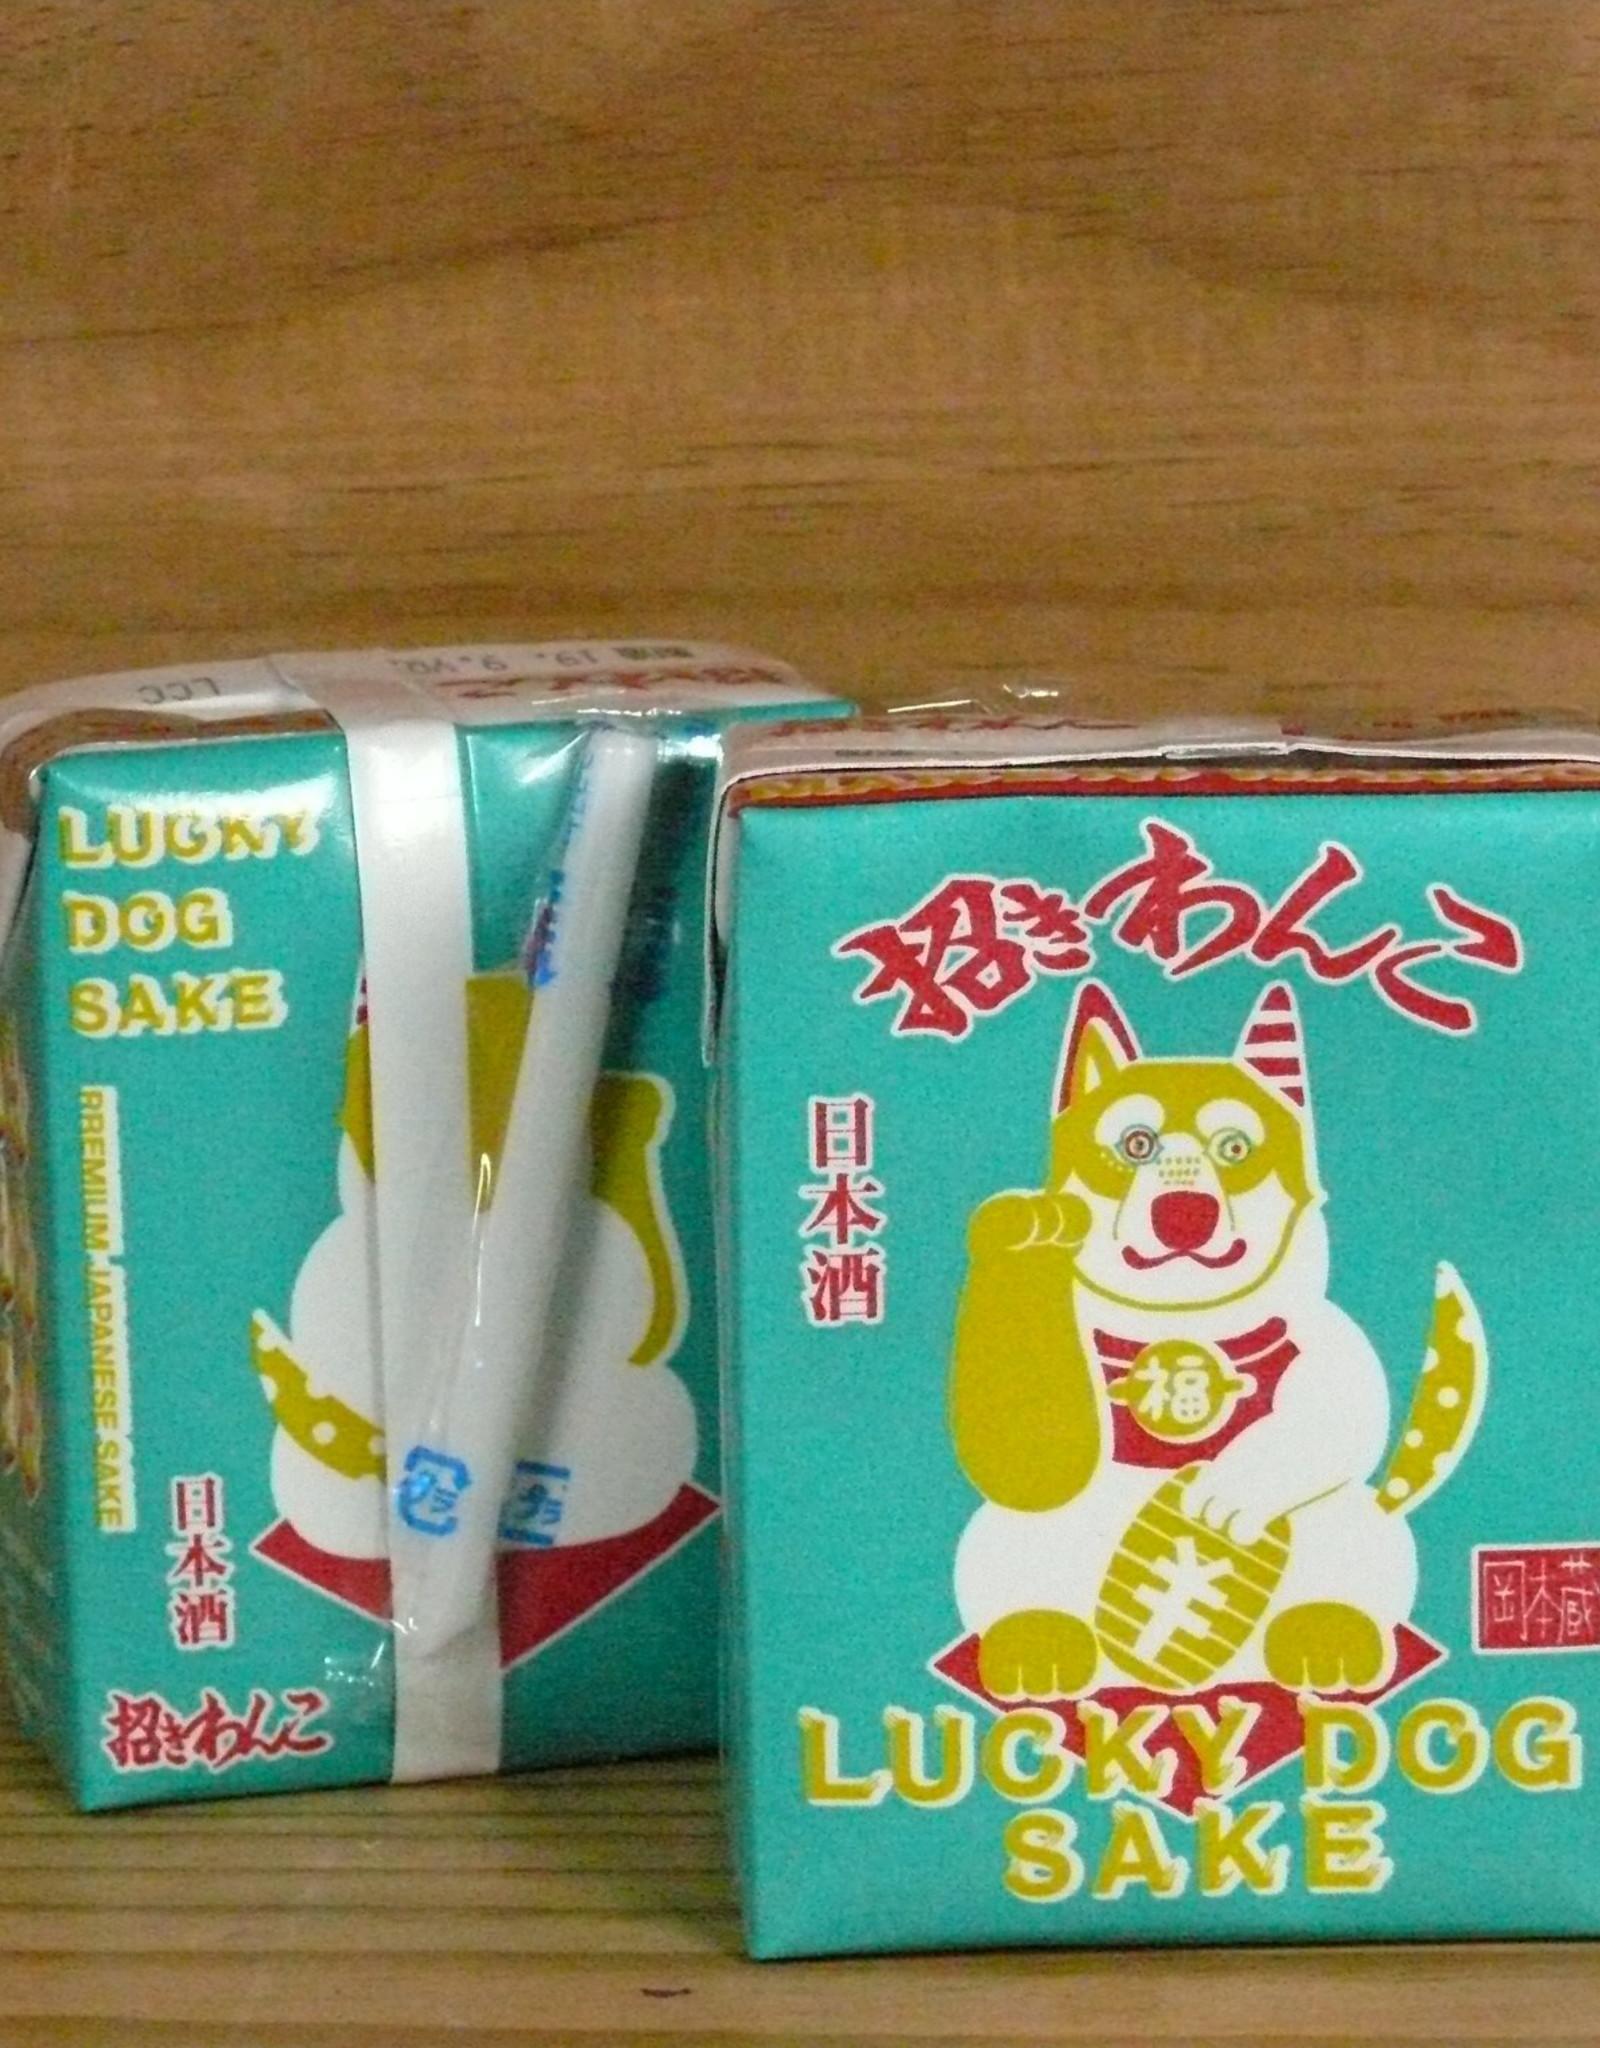 Maneki Wanko 'Lucky Dog' Sake-box